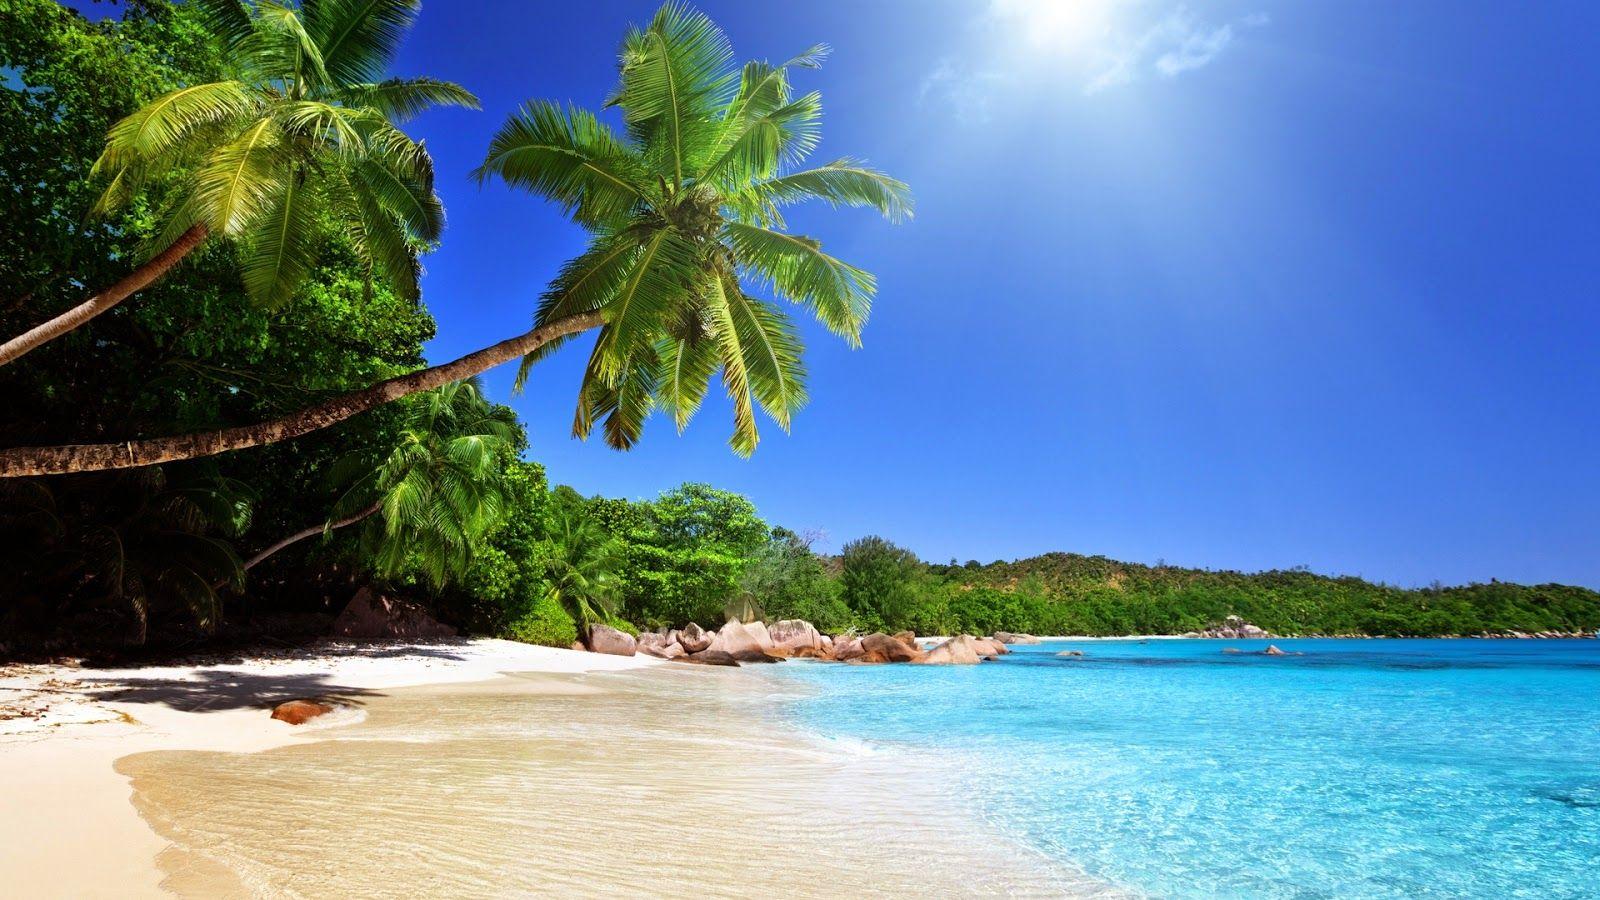 Tropical blue sea clear sky white sand beach view theme hd 1080p tropical blue sea clear sky white sand beach view theme hd 1080p photography wallpaper pixhome voltagebd Choice Image